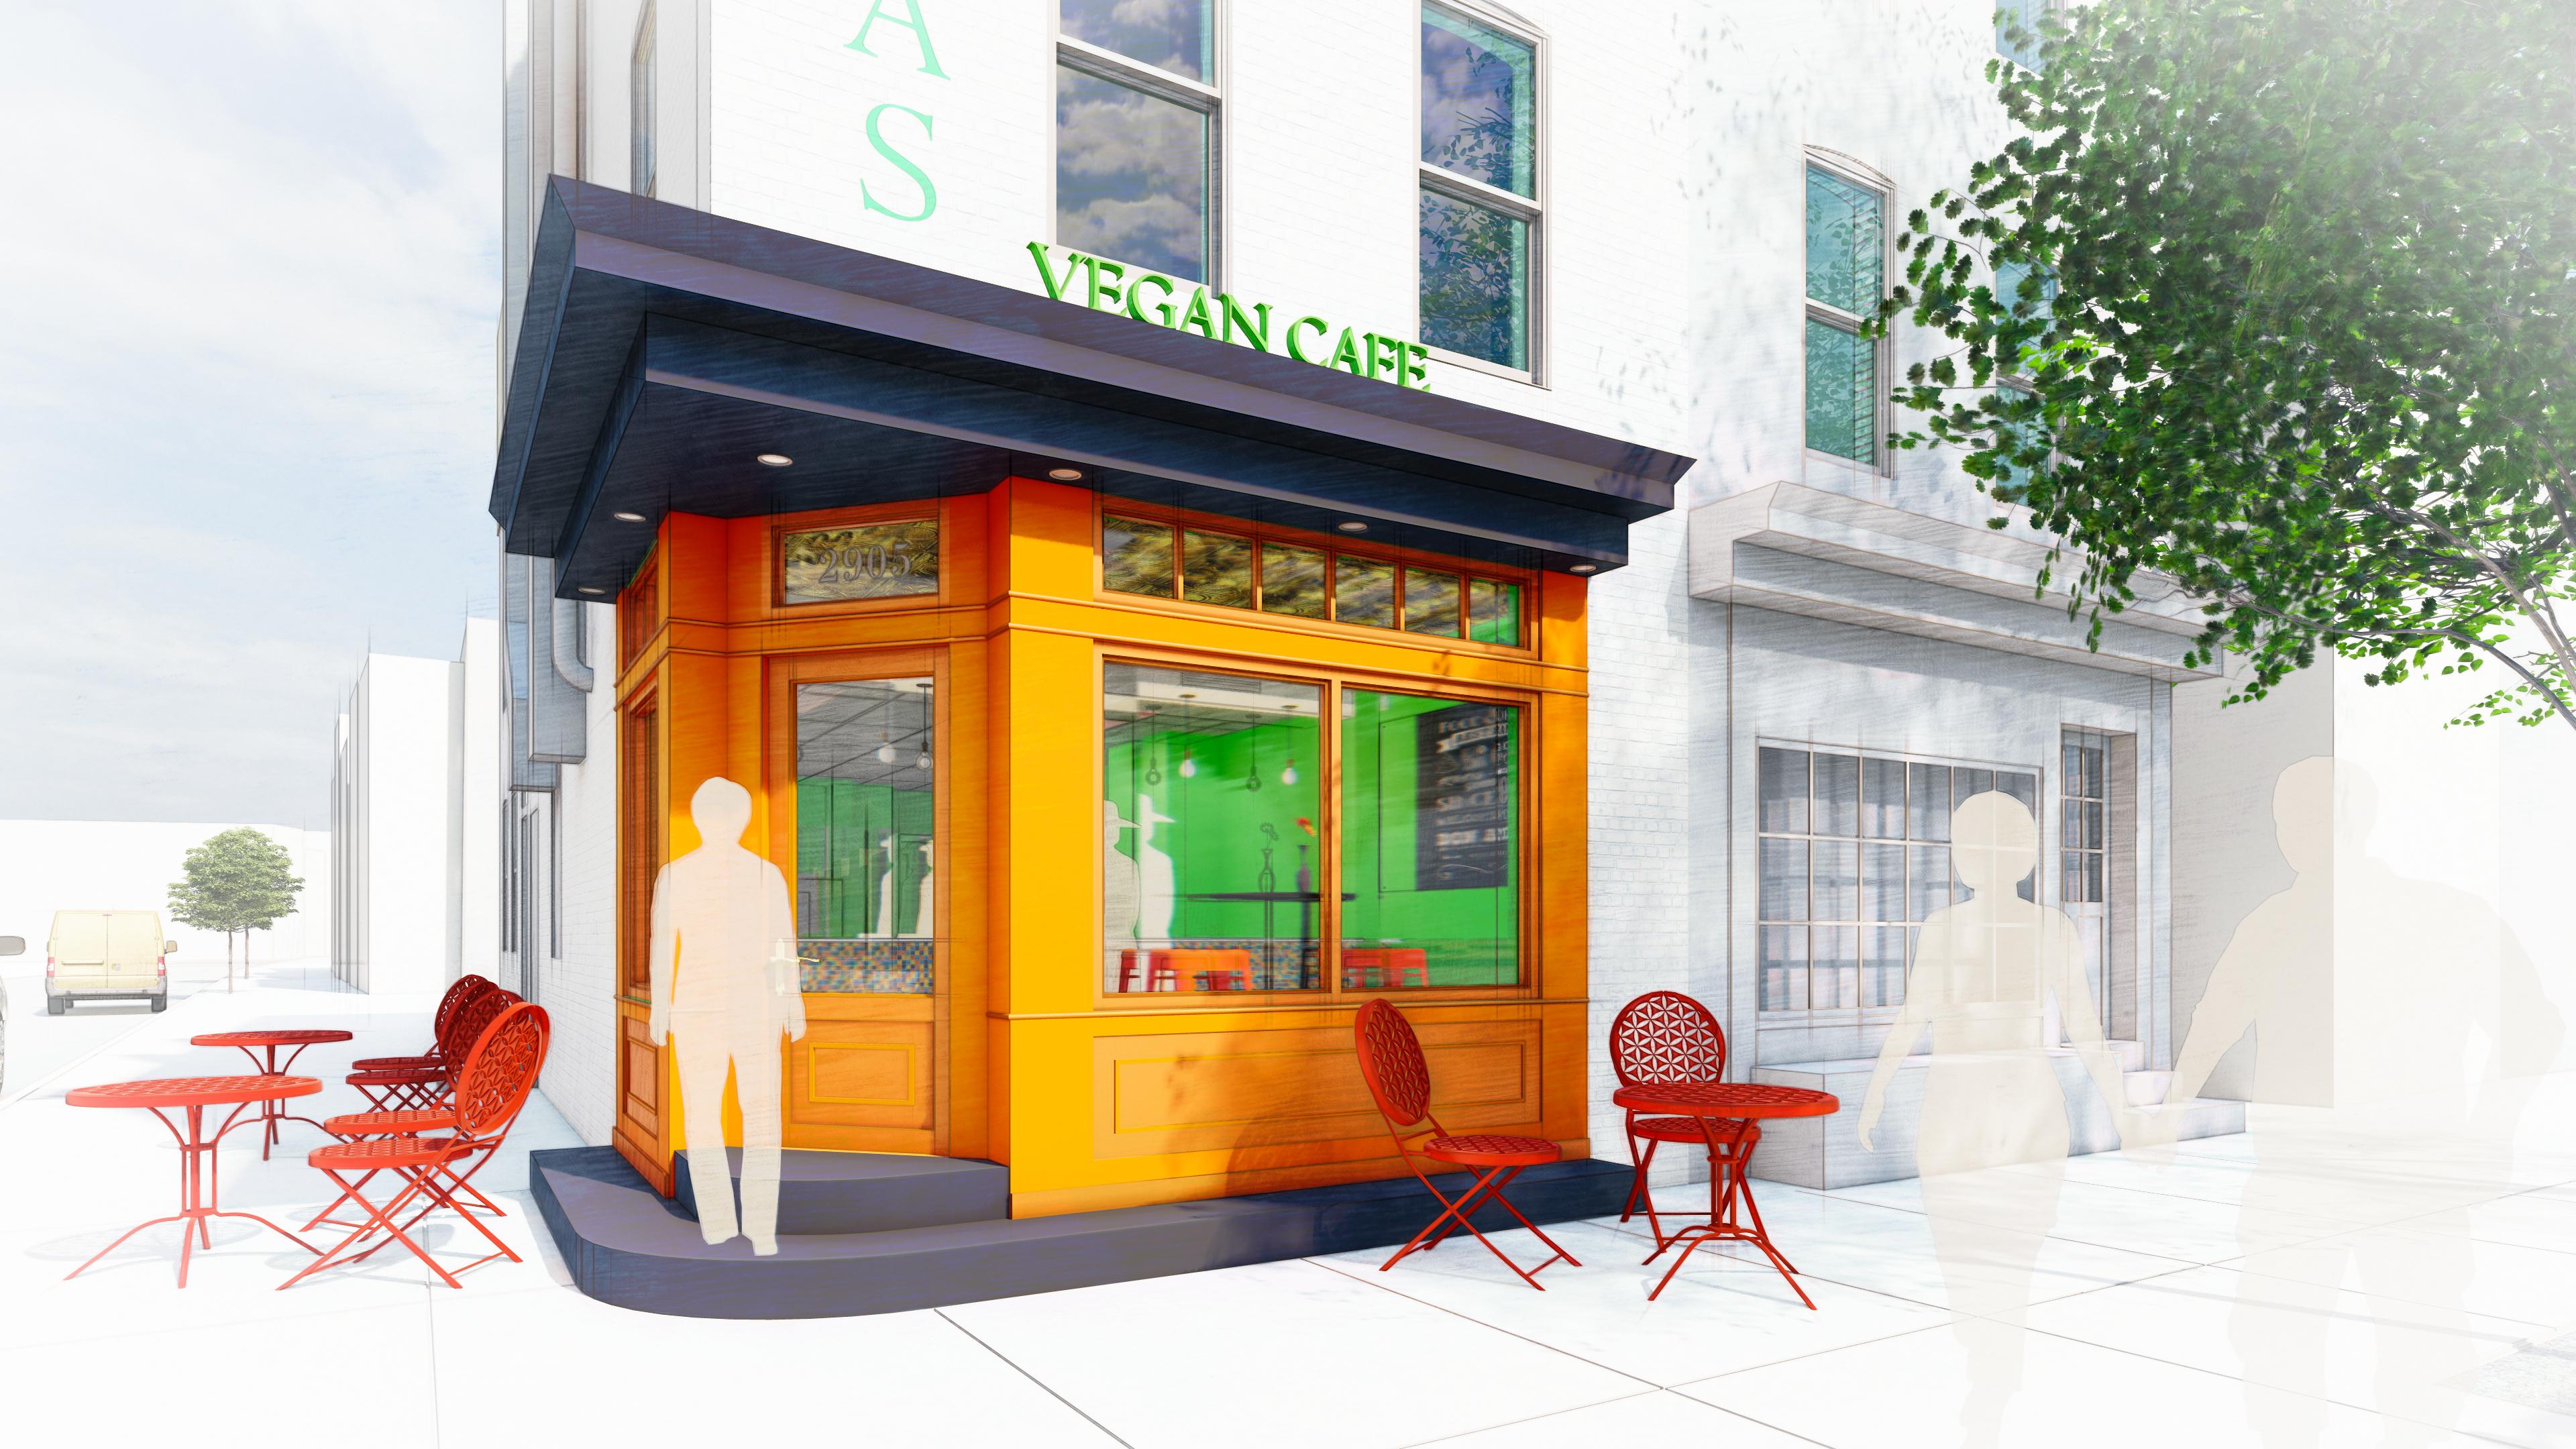 My Mama's Vegan Café   Baltimore, MD